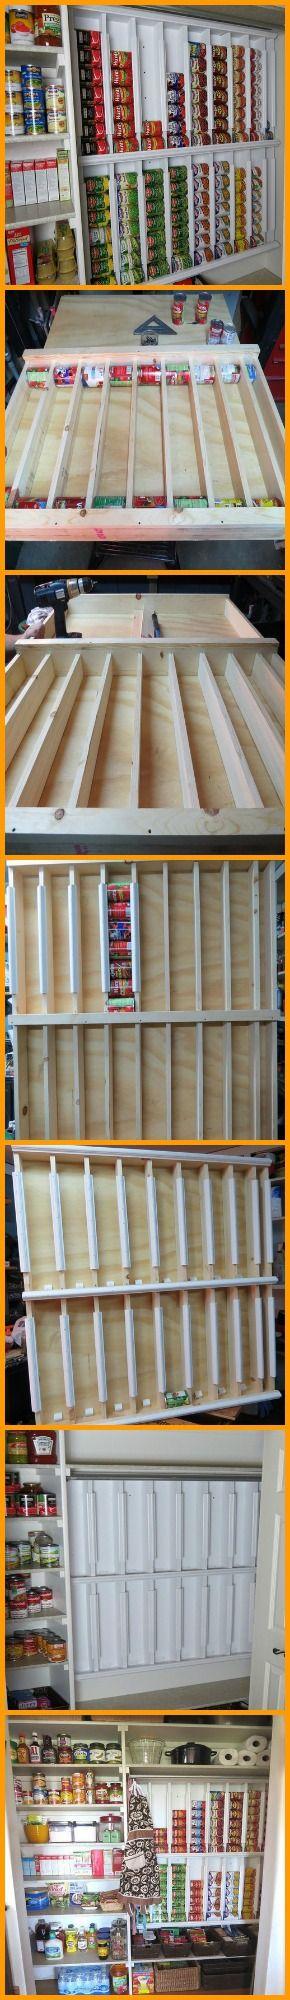 best 25 canned food storage ideas on pinterest. Black Bedroom Furniture Sets. Home Design Ideas